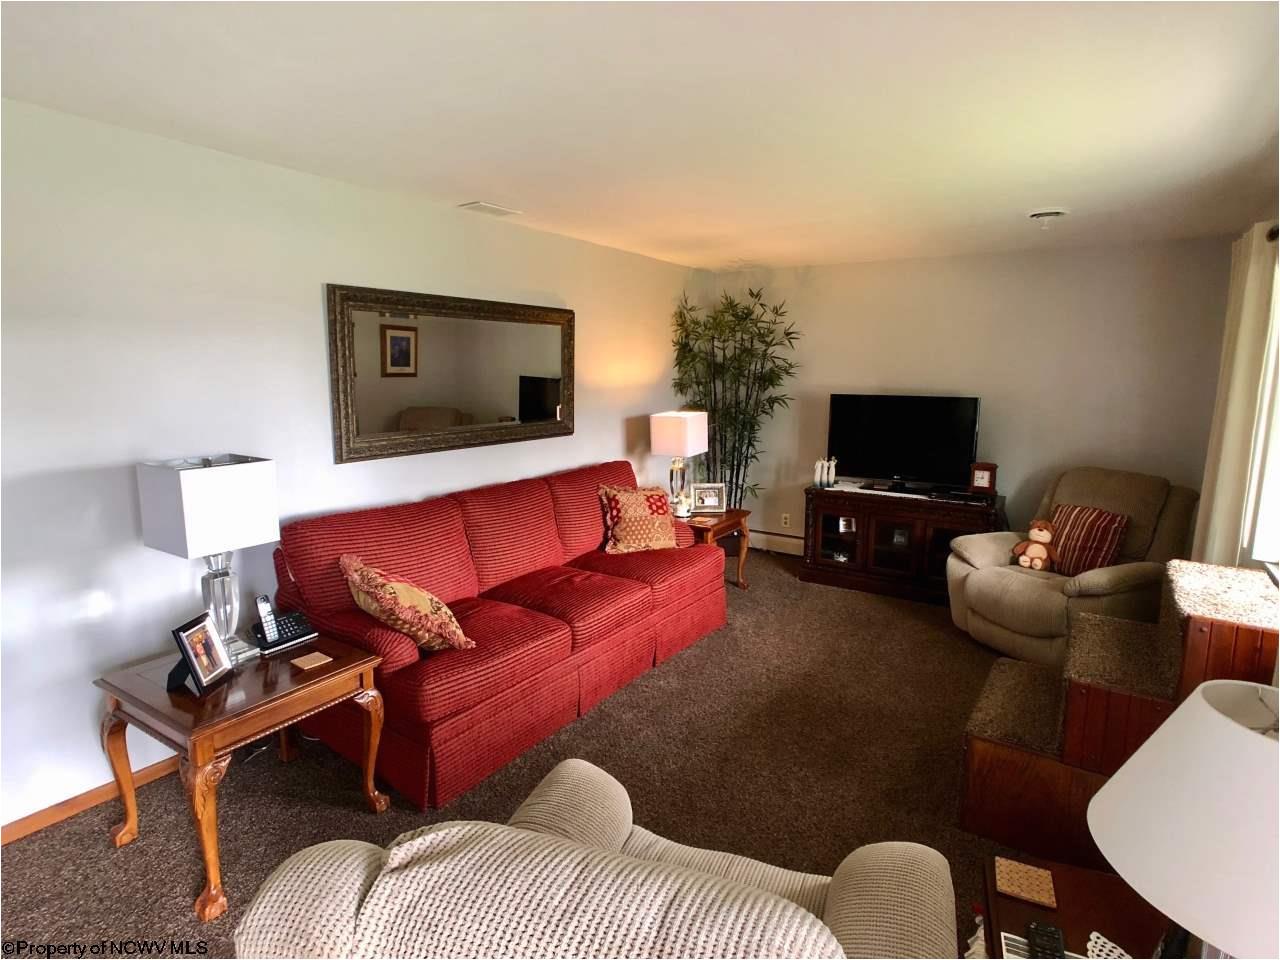 Discount Furniture Stores Morgantown Wv 56 Hartford Street Morgantown Wv 26501 Single Family Houses